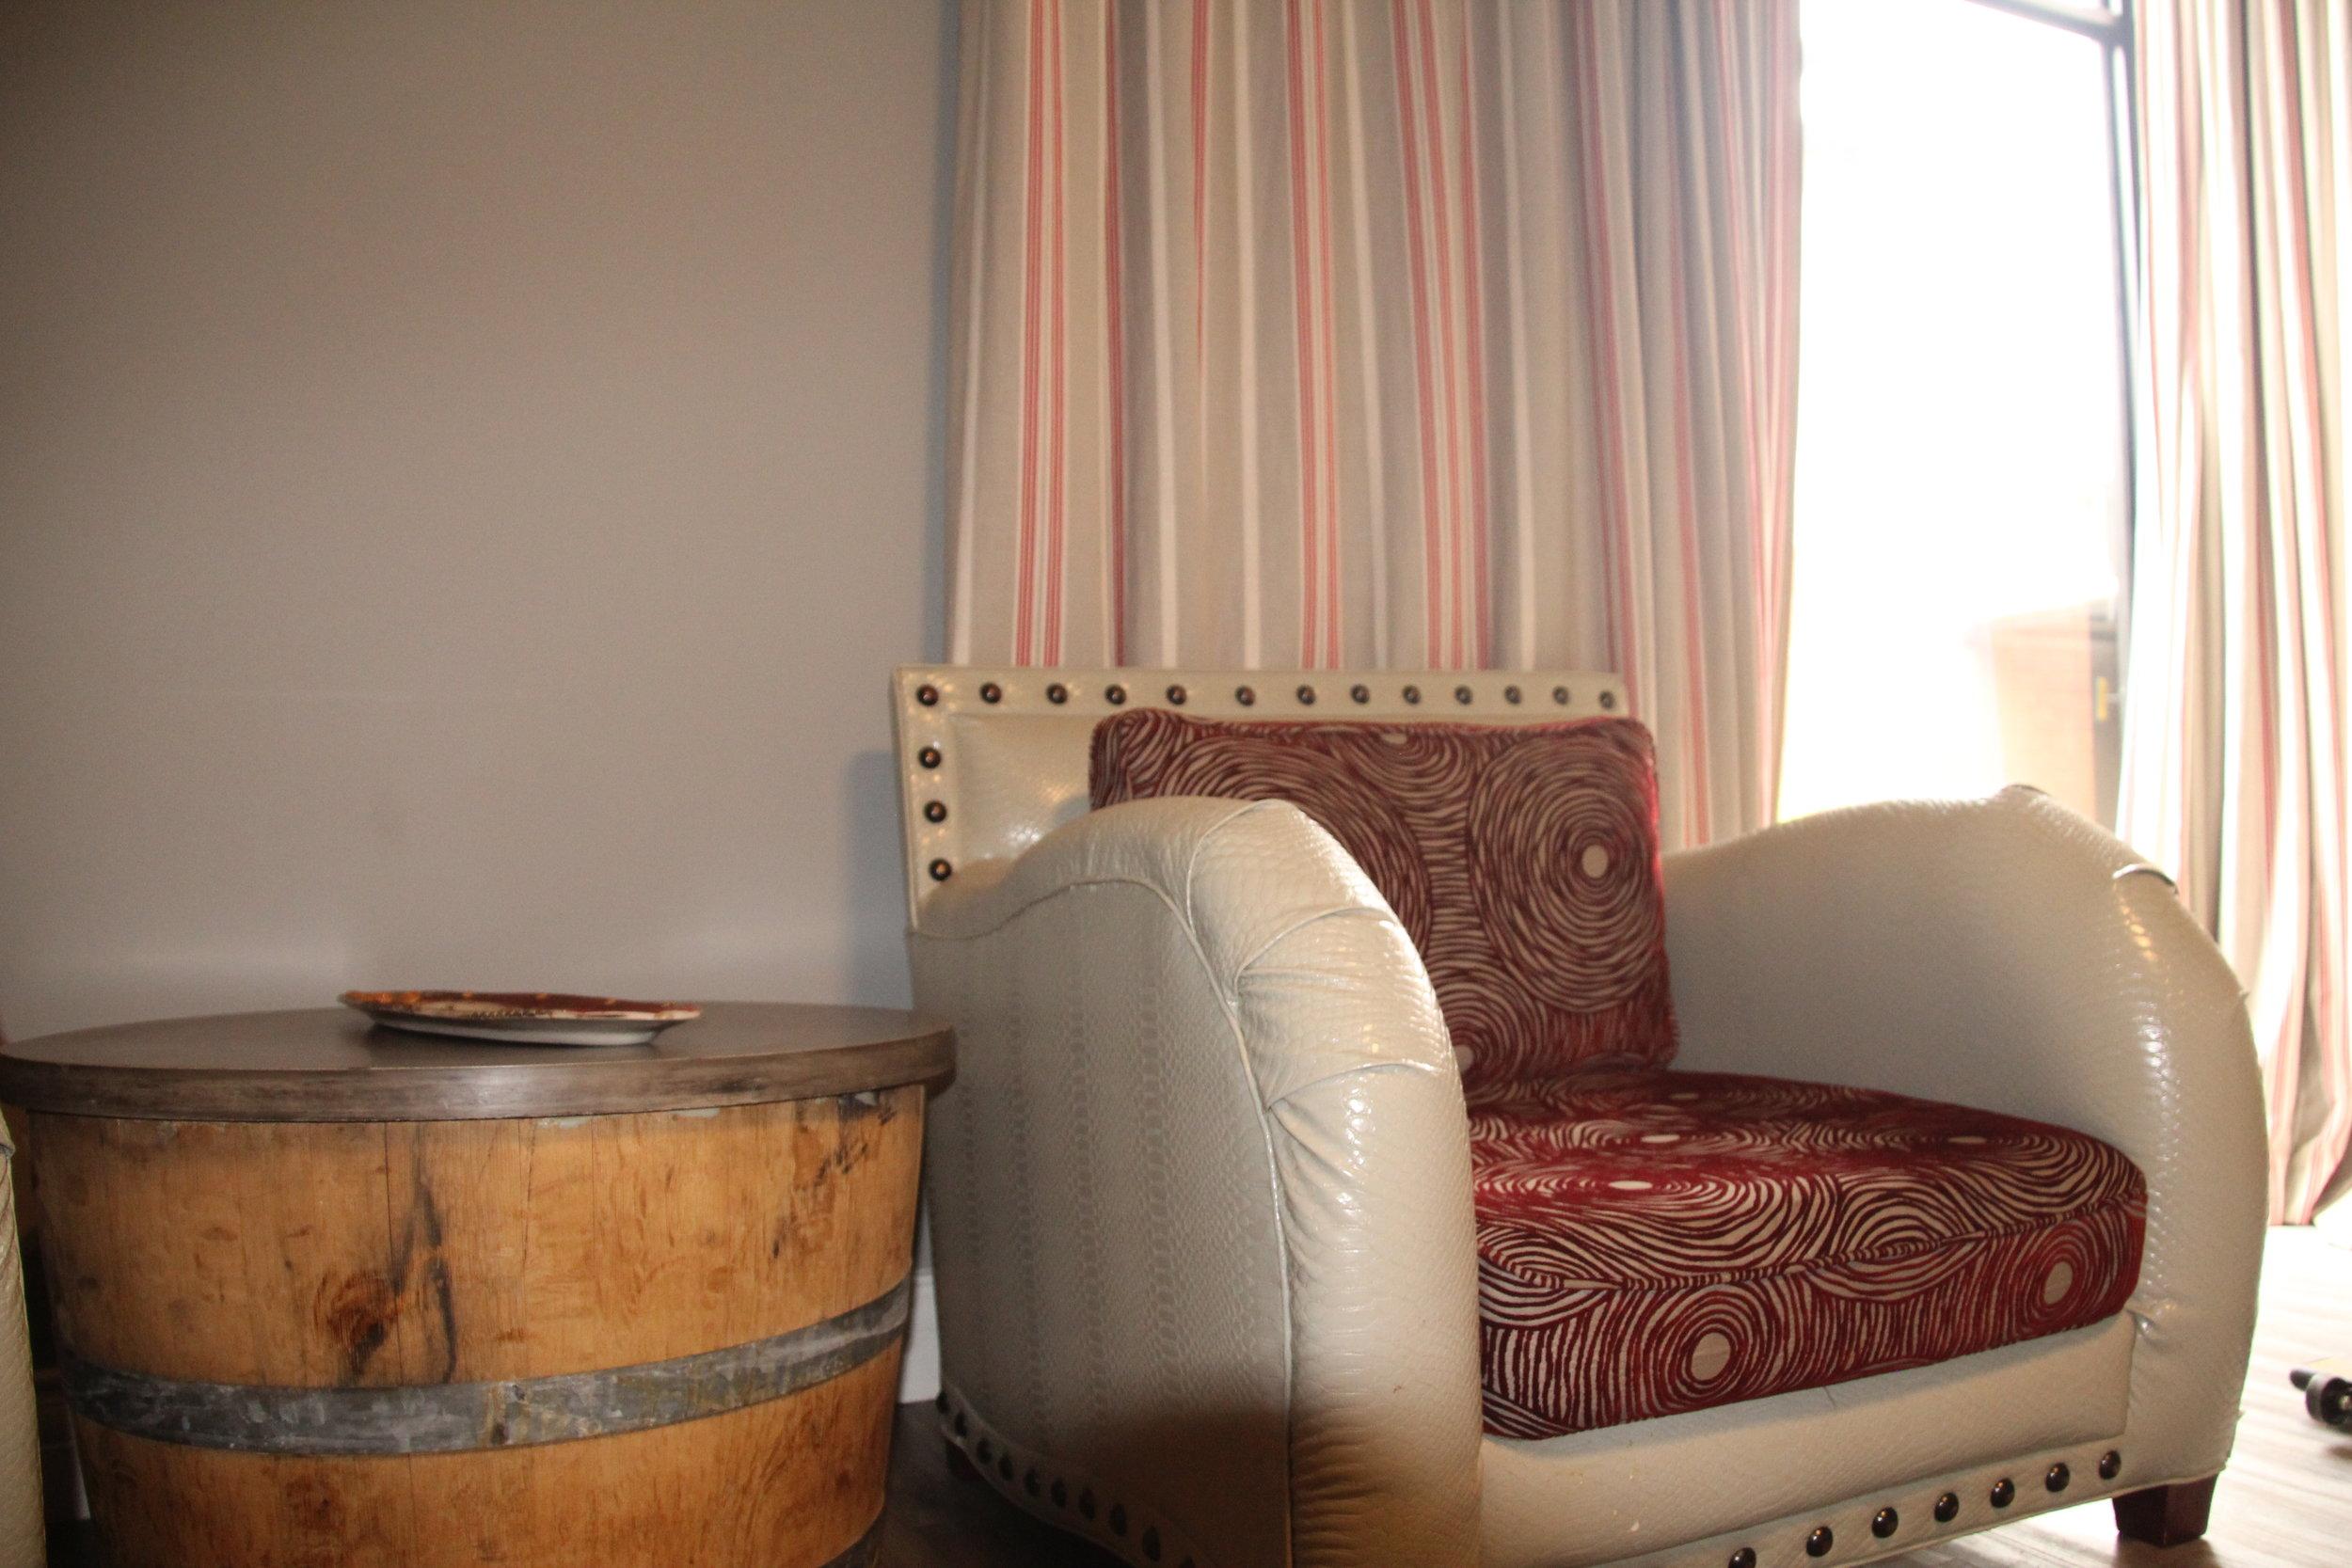 2 Lounge Chair and coffee table.JPG